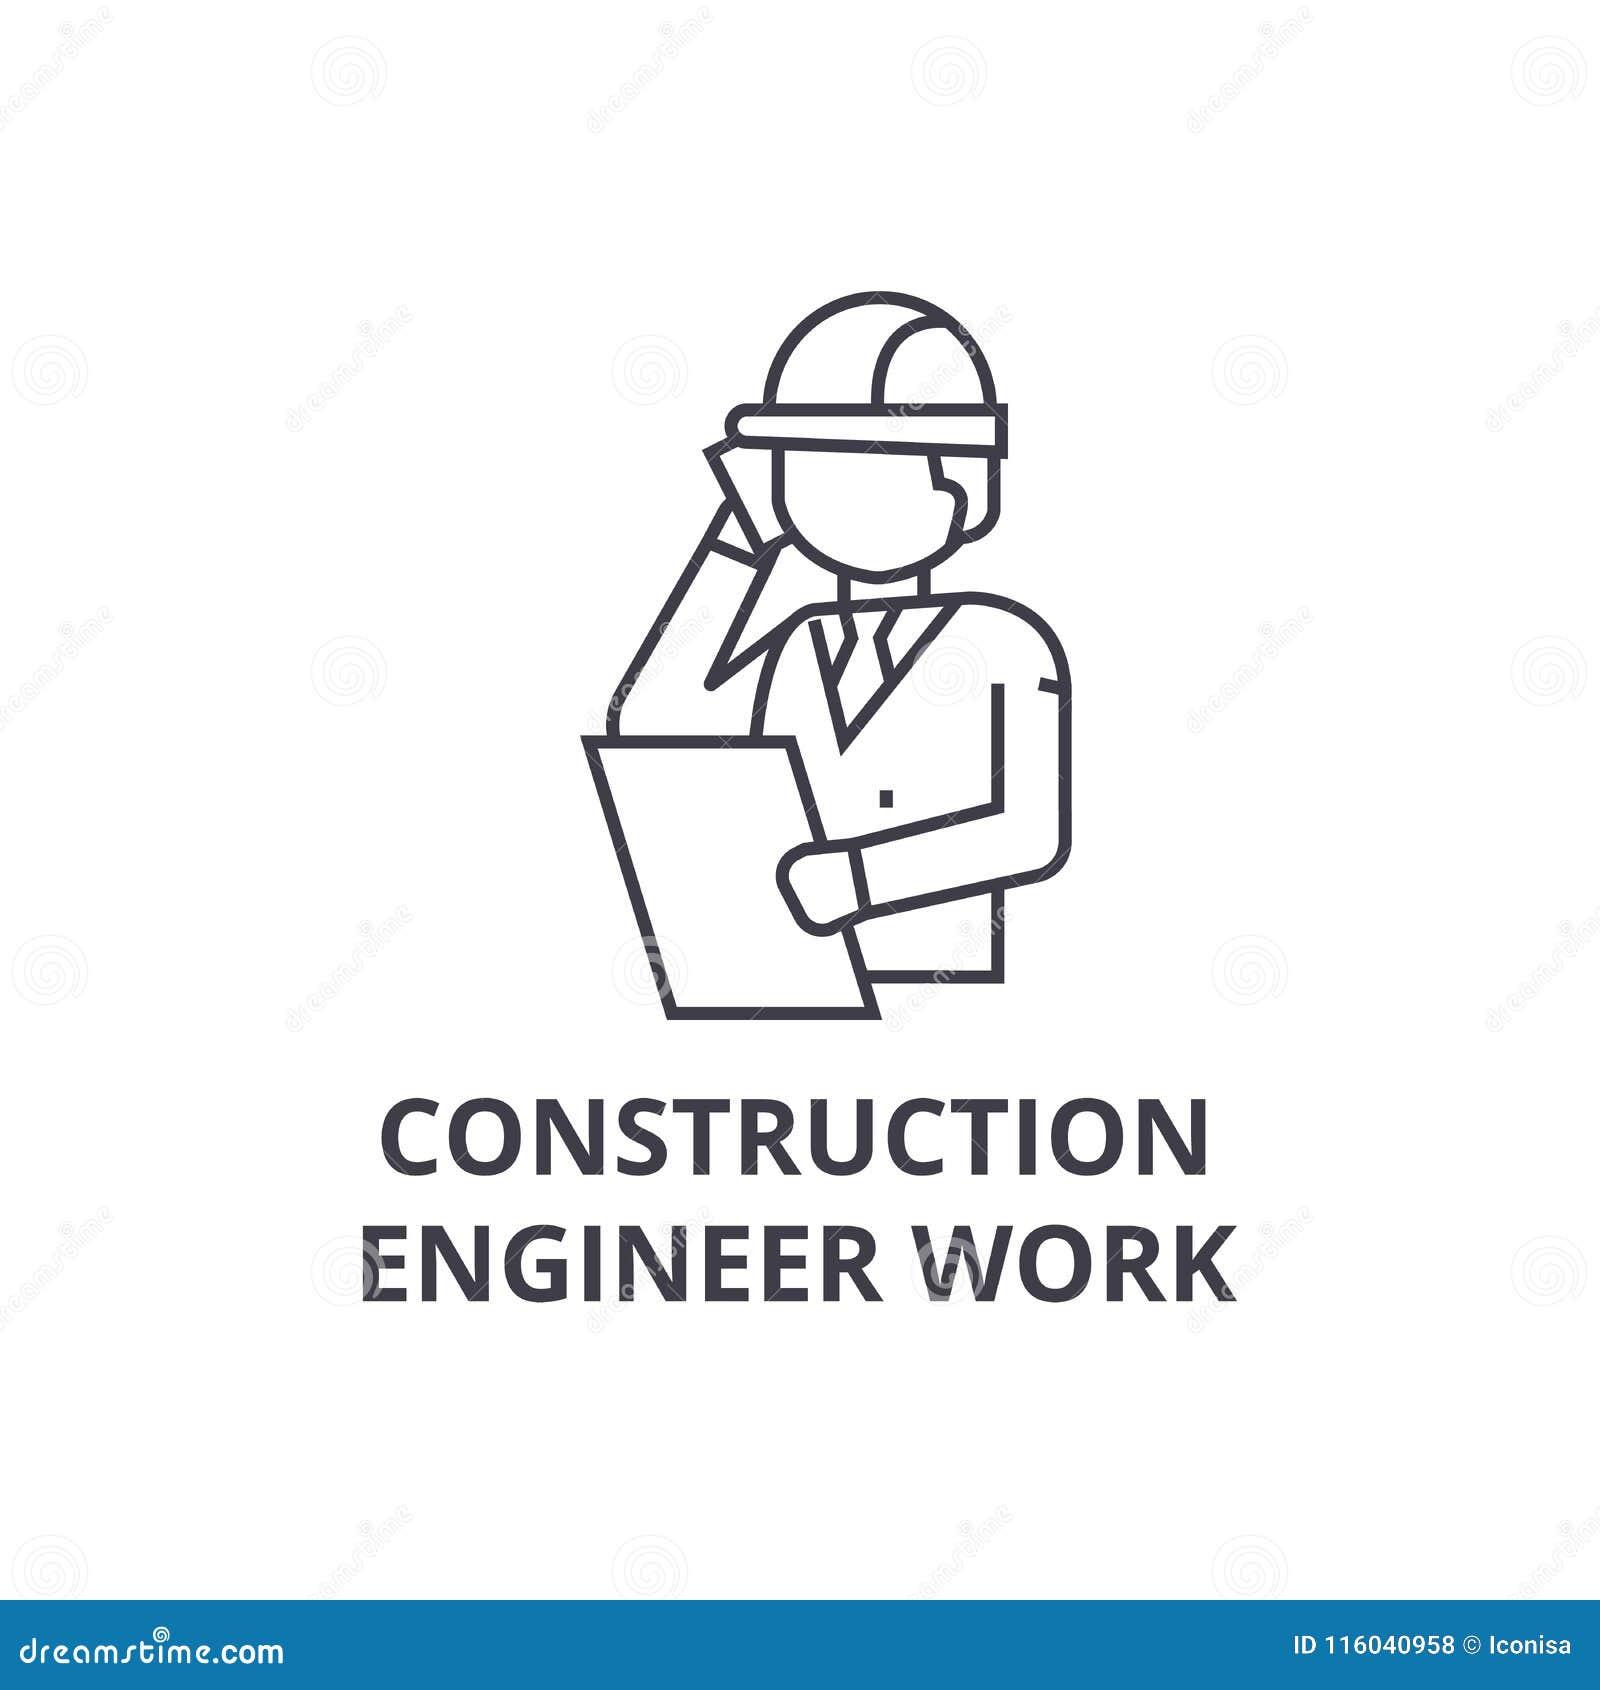 Construction engineer talk vector line icon, sign, illustration on background, editable strokes